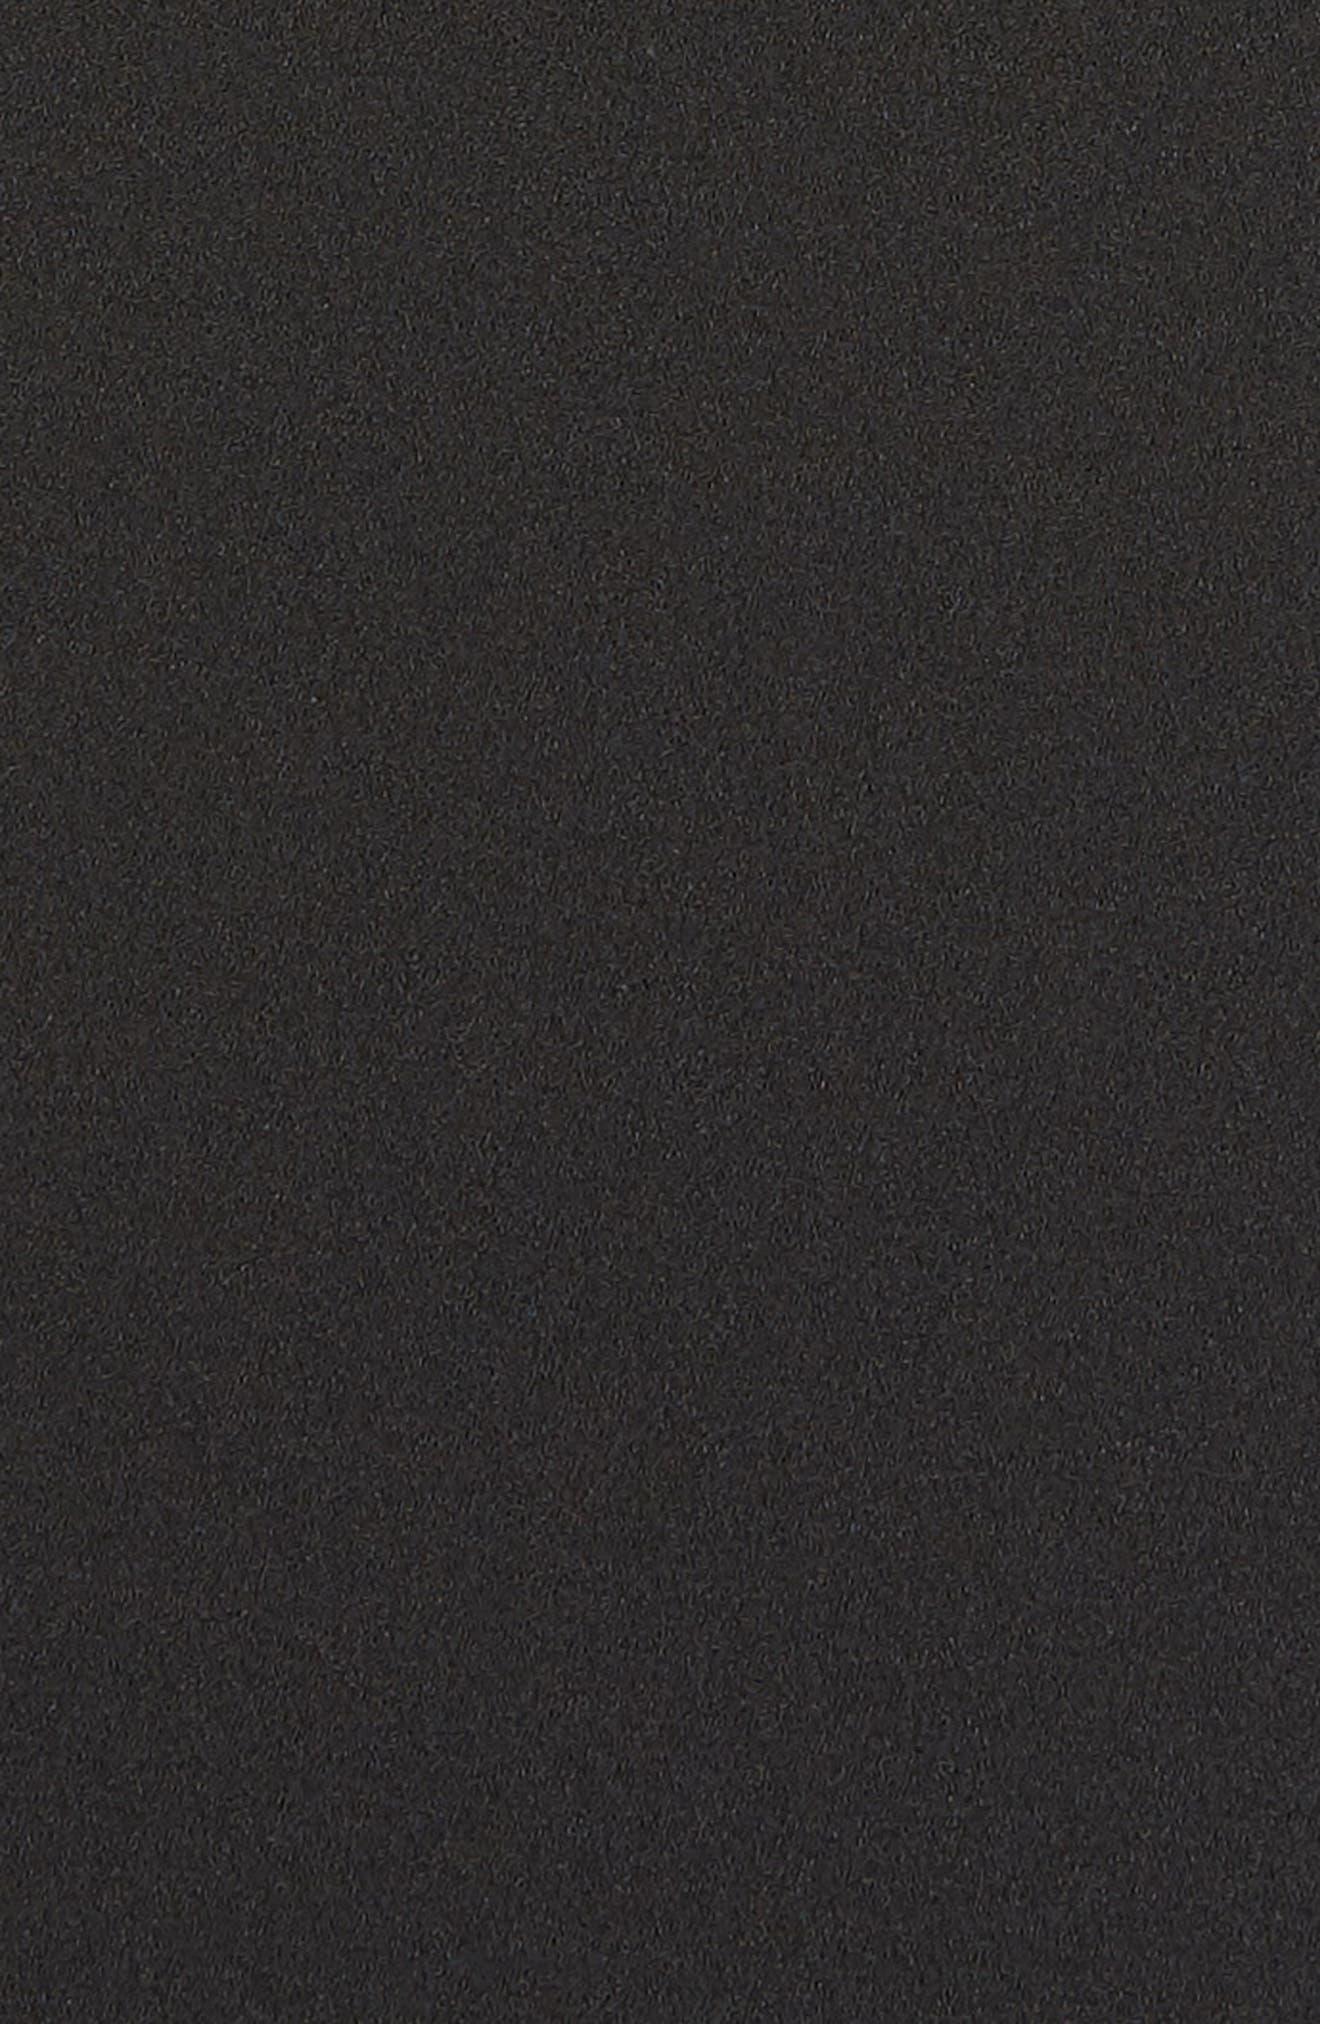 Asymmetrical Ruffle Neck Crepe Cocktail Dress,                             Alternate thumbnail 6, color,                             BLACK